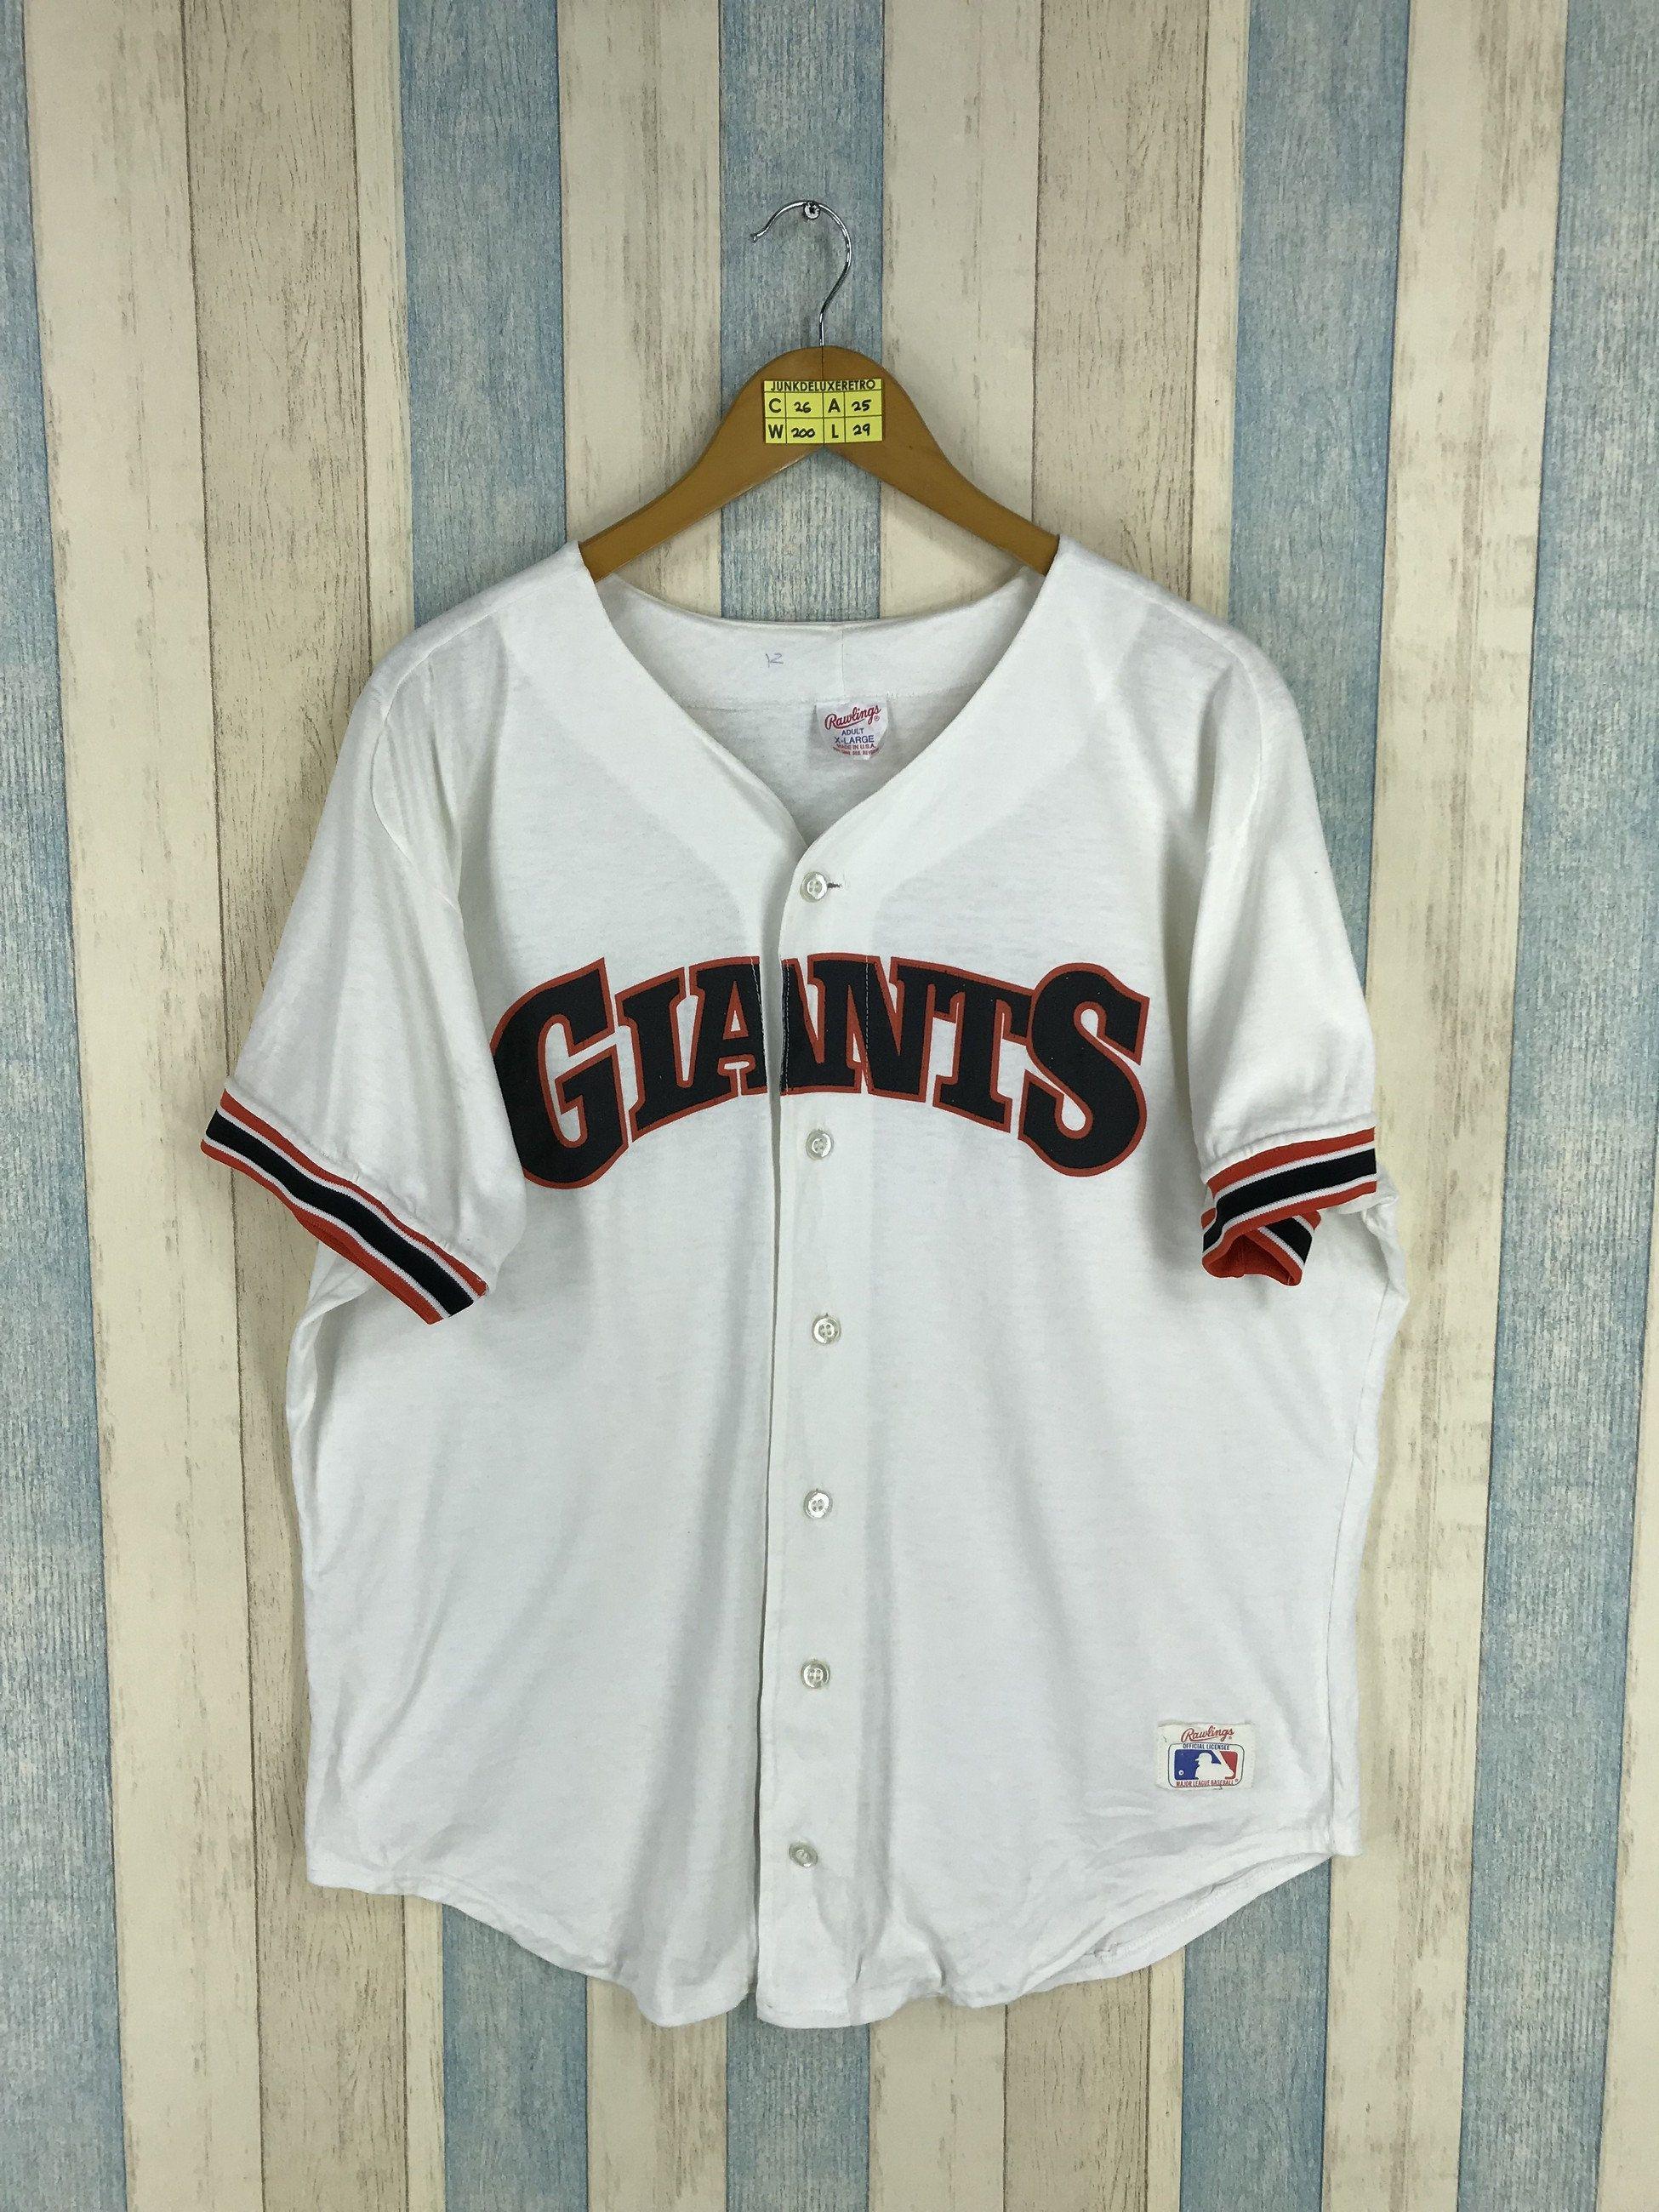 e84ebb1b GIANTS Baseball Fan Club Jersey Shirt Xlarge Baseball Jersey Major League  Baseball Vintage San Francisco Giants Jersey Mlb Size XL by JunkDeluxeRetro  on ...